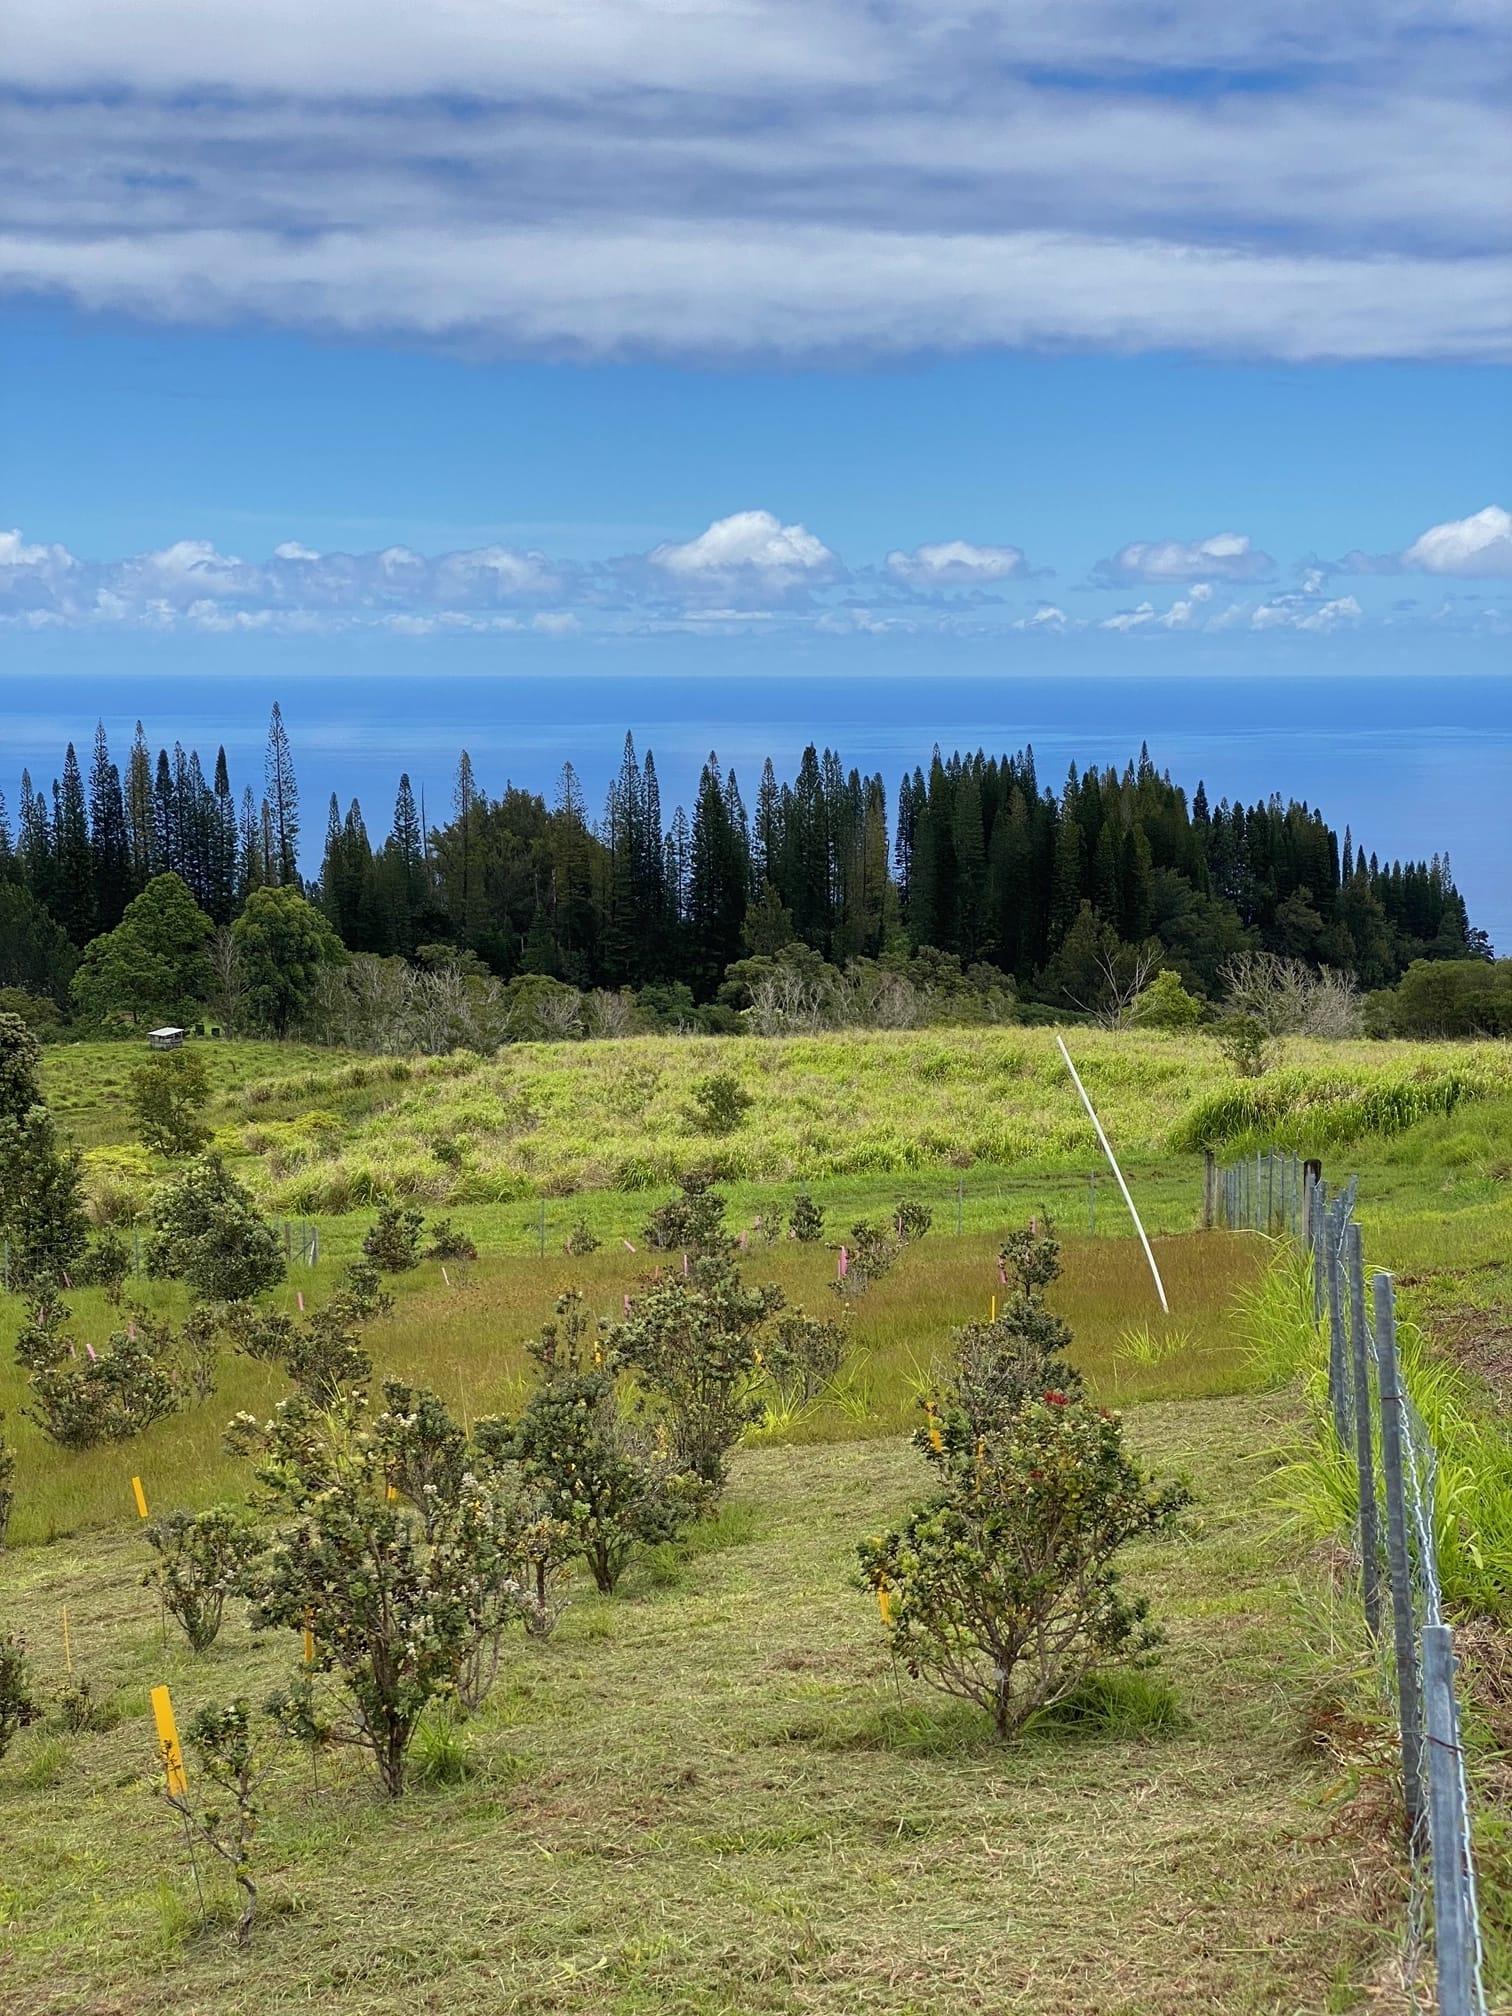 Brian Tucker Kupuaʻe ʻŌhiʻa Common Garden